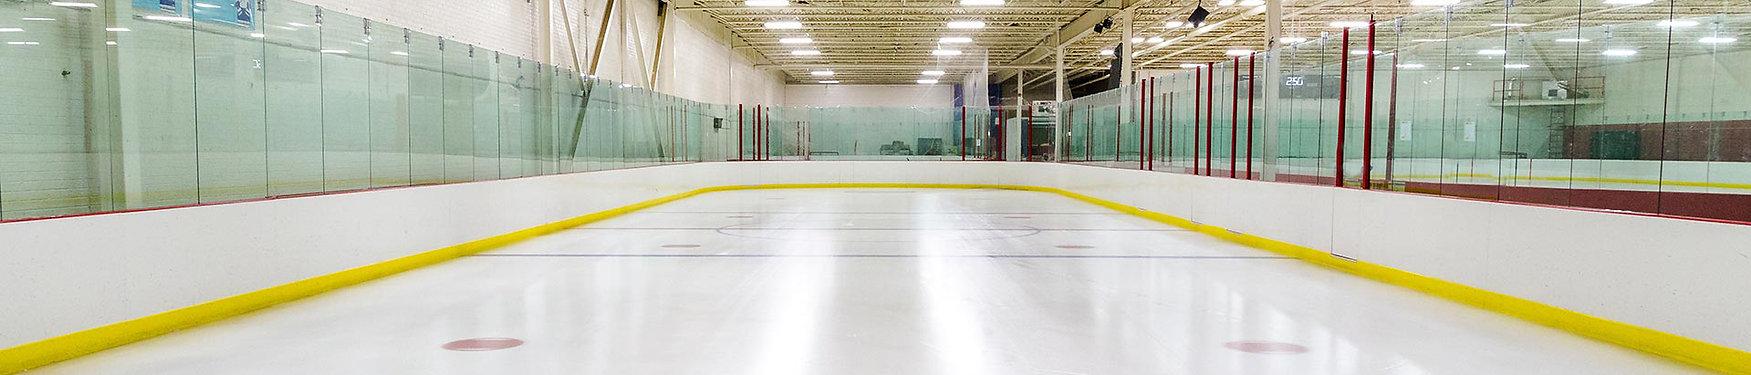 Ice_Hockey_Rink.jpg